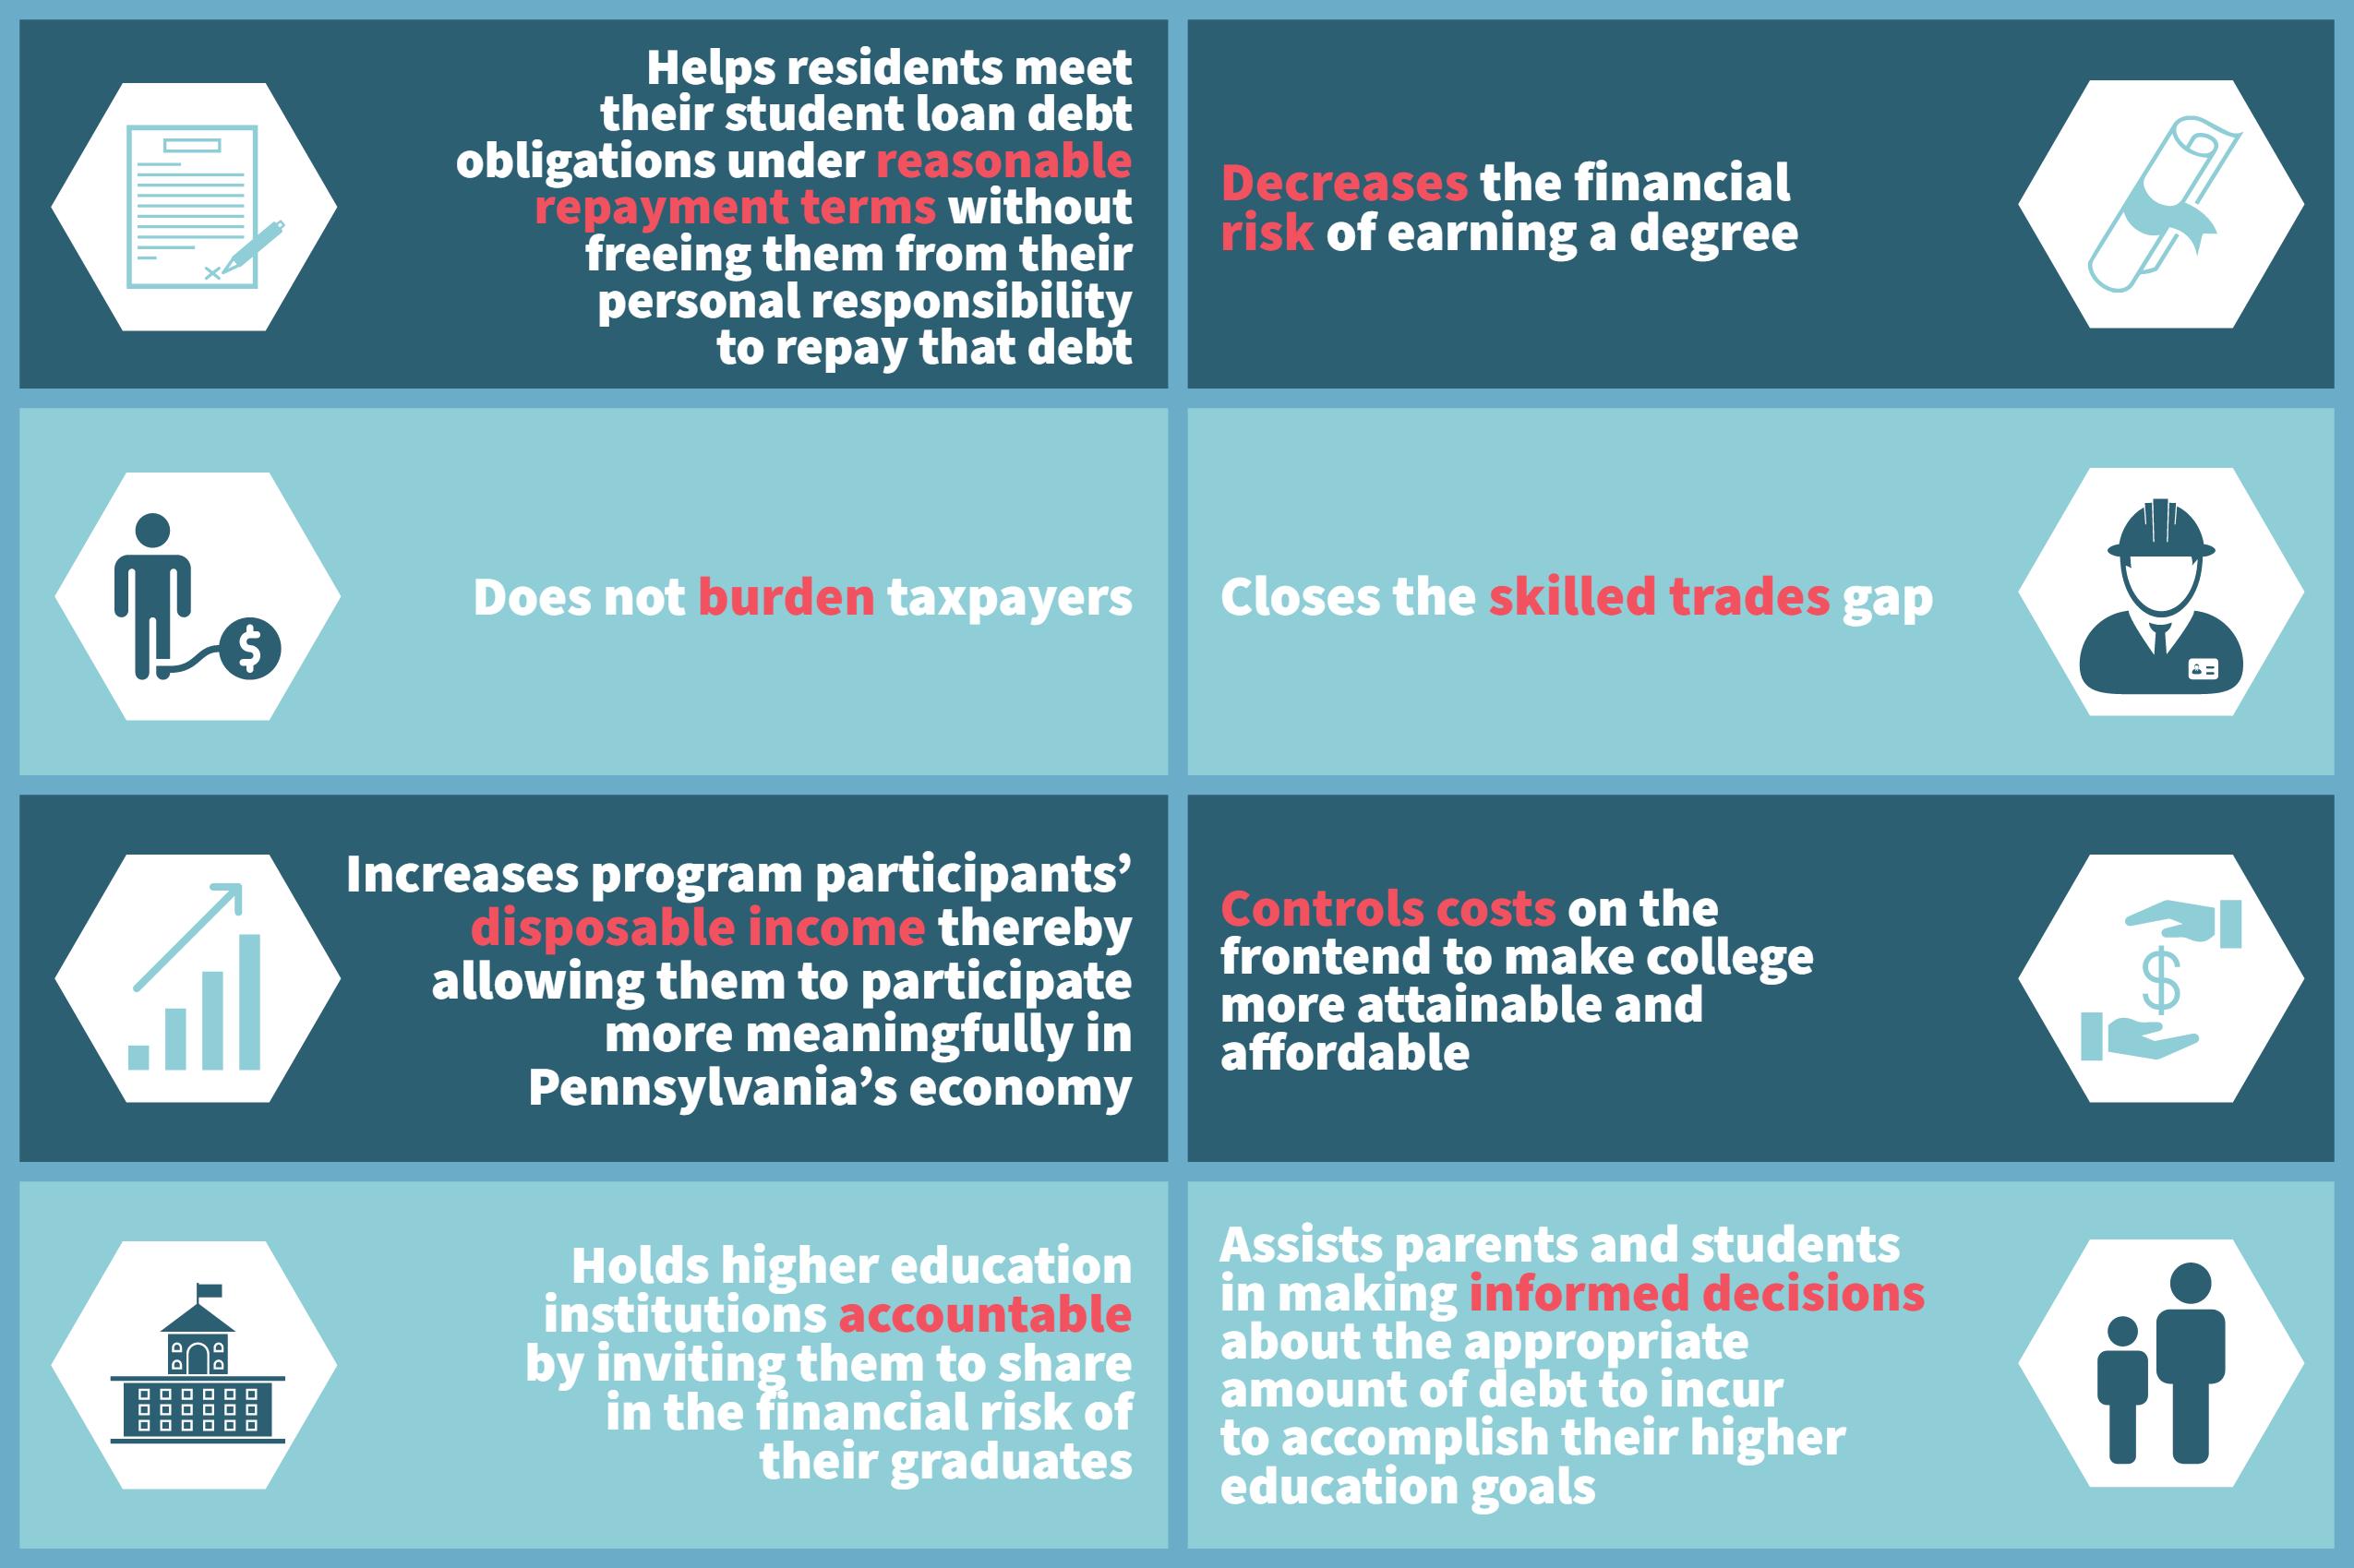 Student Loan Debt Goals